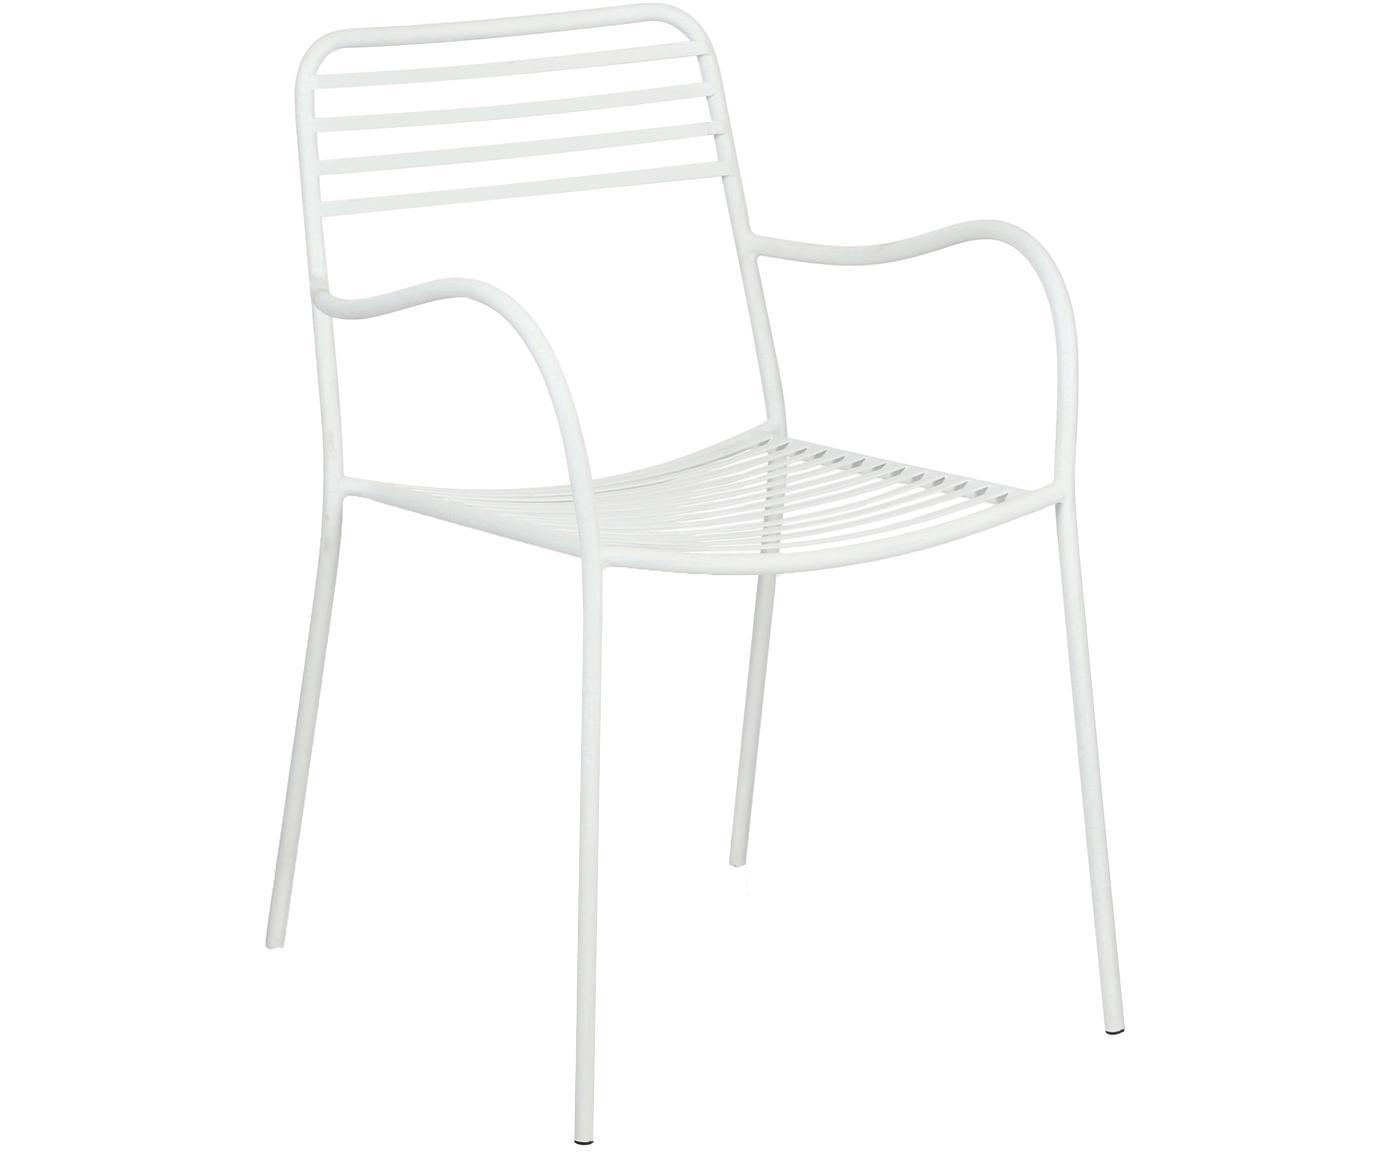 Balkon-Armlehnstühle Tula aus Metall, 2 Stück, Metall, pulverbeschichtet, Weiß, B 50 x T 60 cm